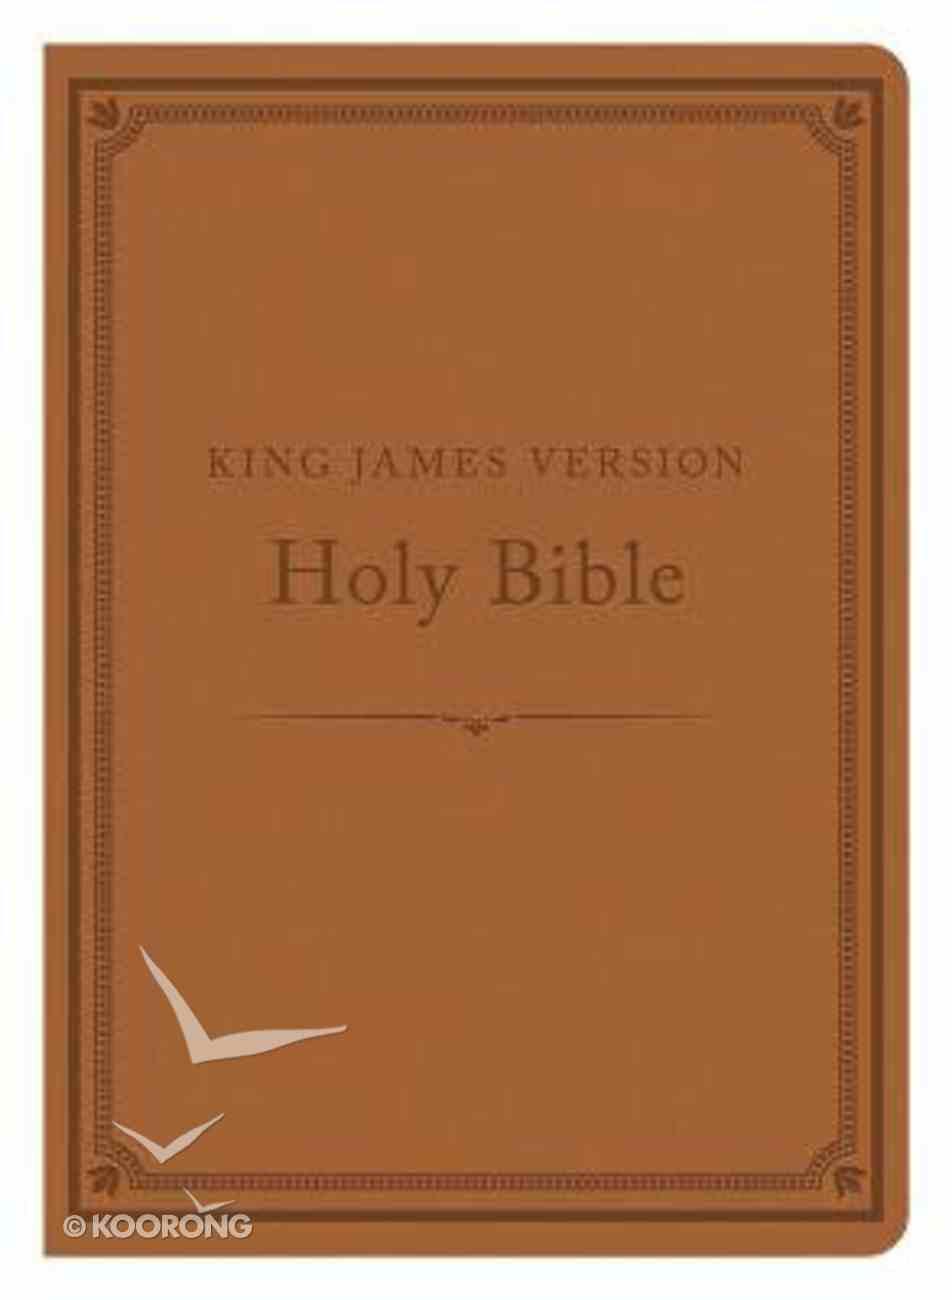 KJV Compact Gift & Award Bible Reference Edition Camel Imitation Leather